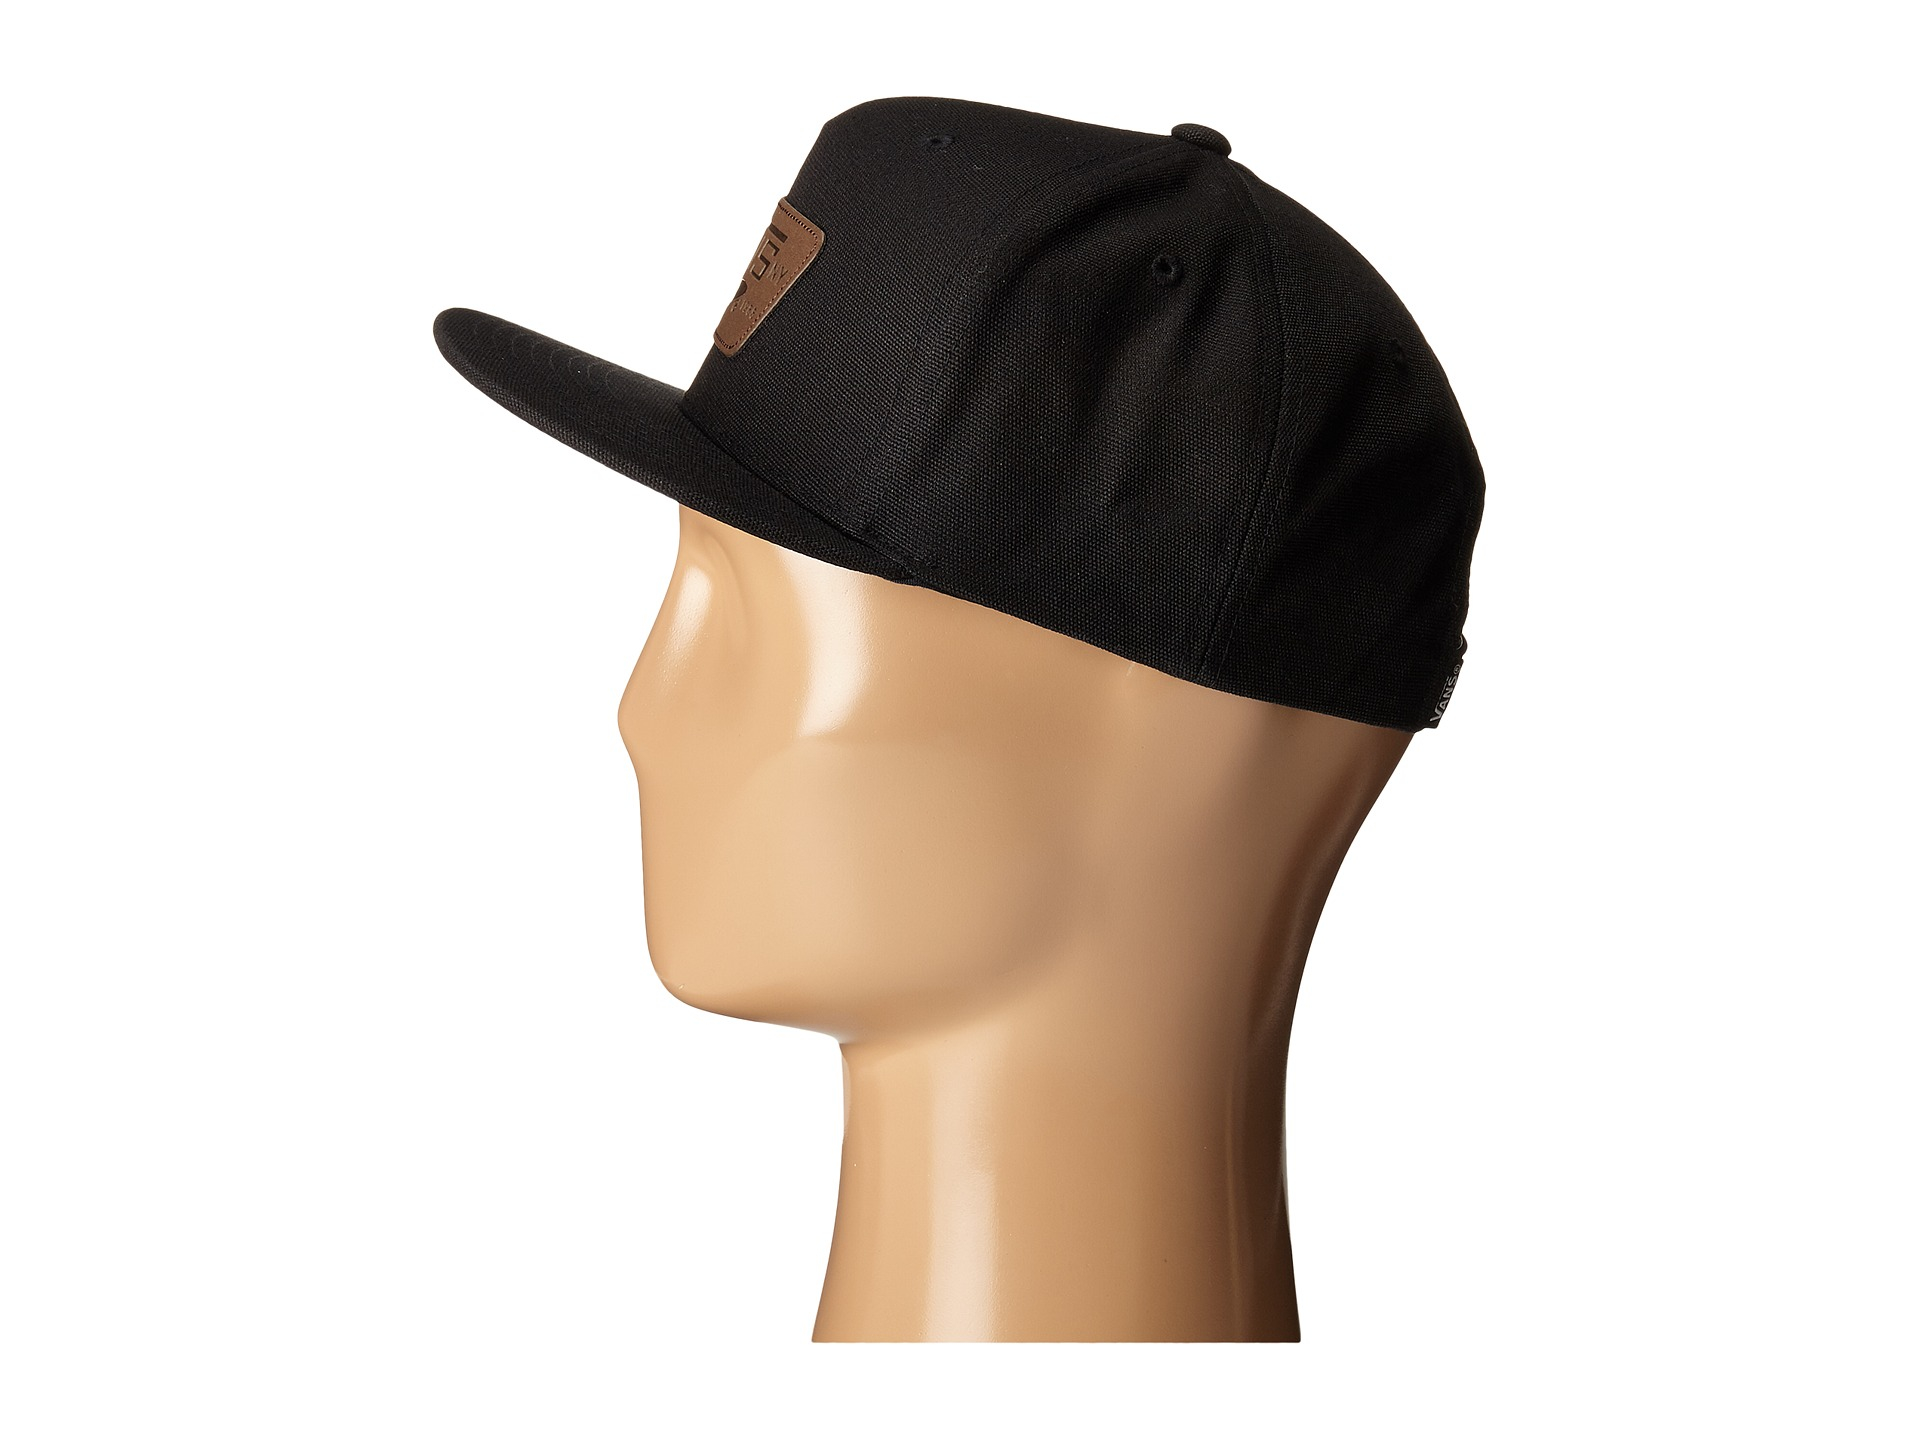 Lyst - Vans Full Patch Starter in Black for Men 6c8a7a8cfa9a